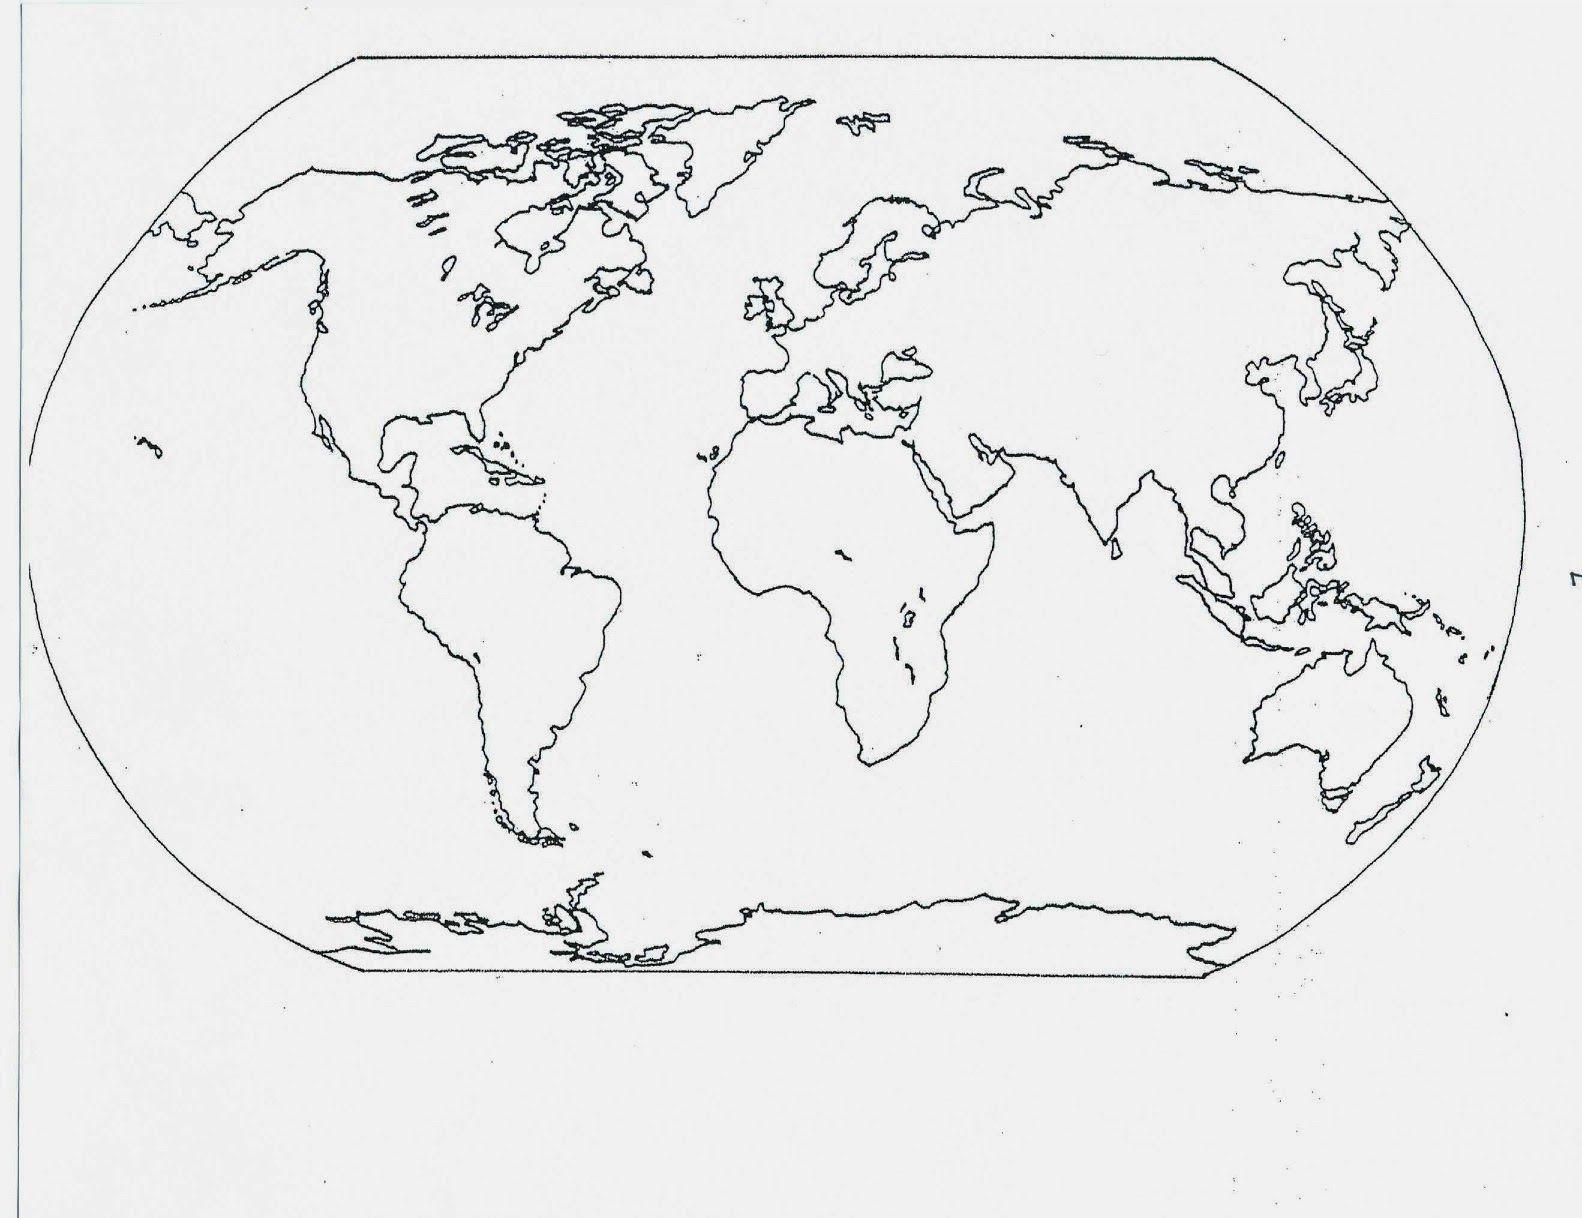 Catholic Schoolhouse Year 3 Free Printable Blank Maps Blank World Map World Map Printable World Map Outline